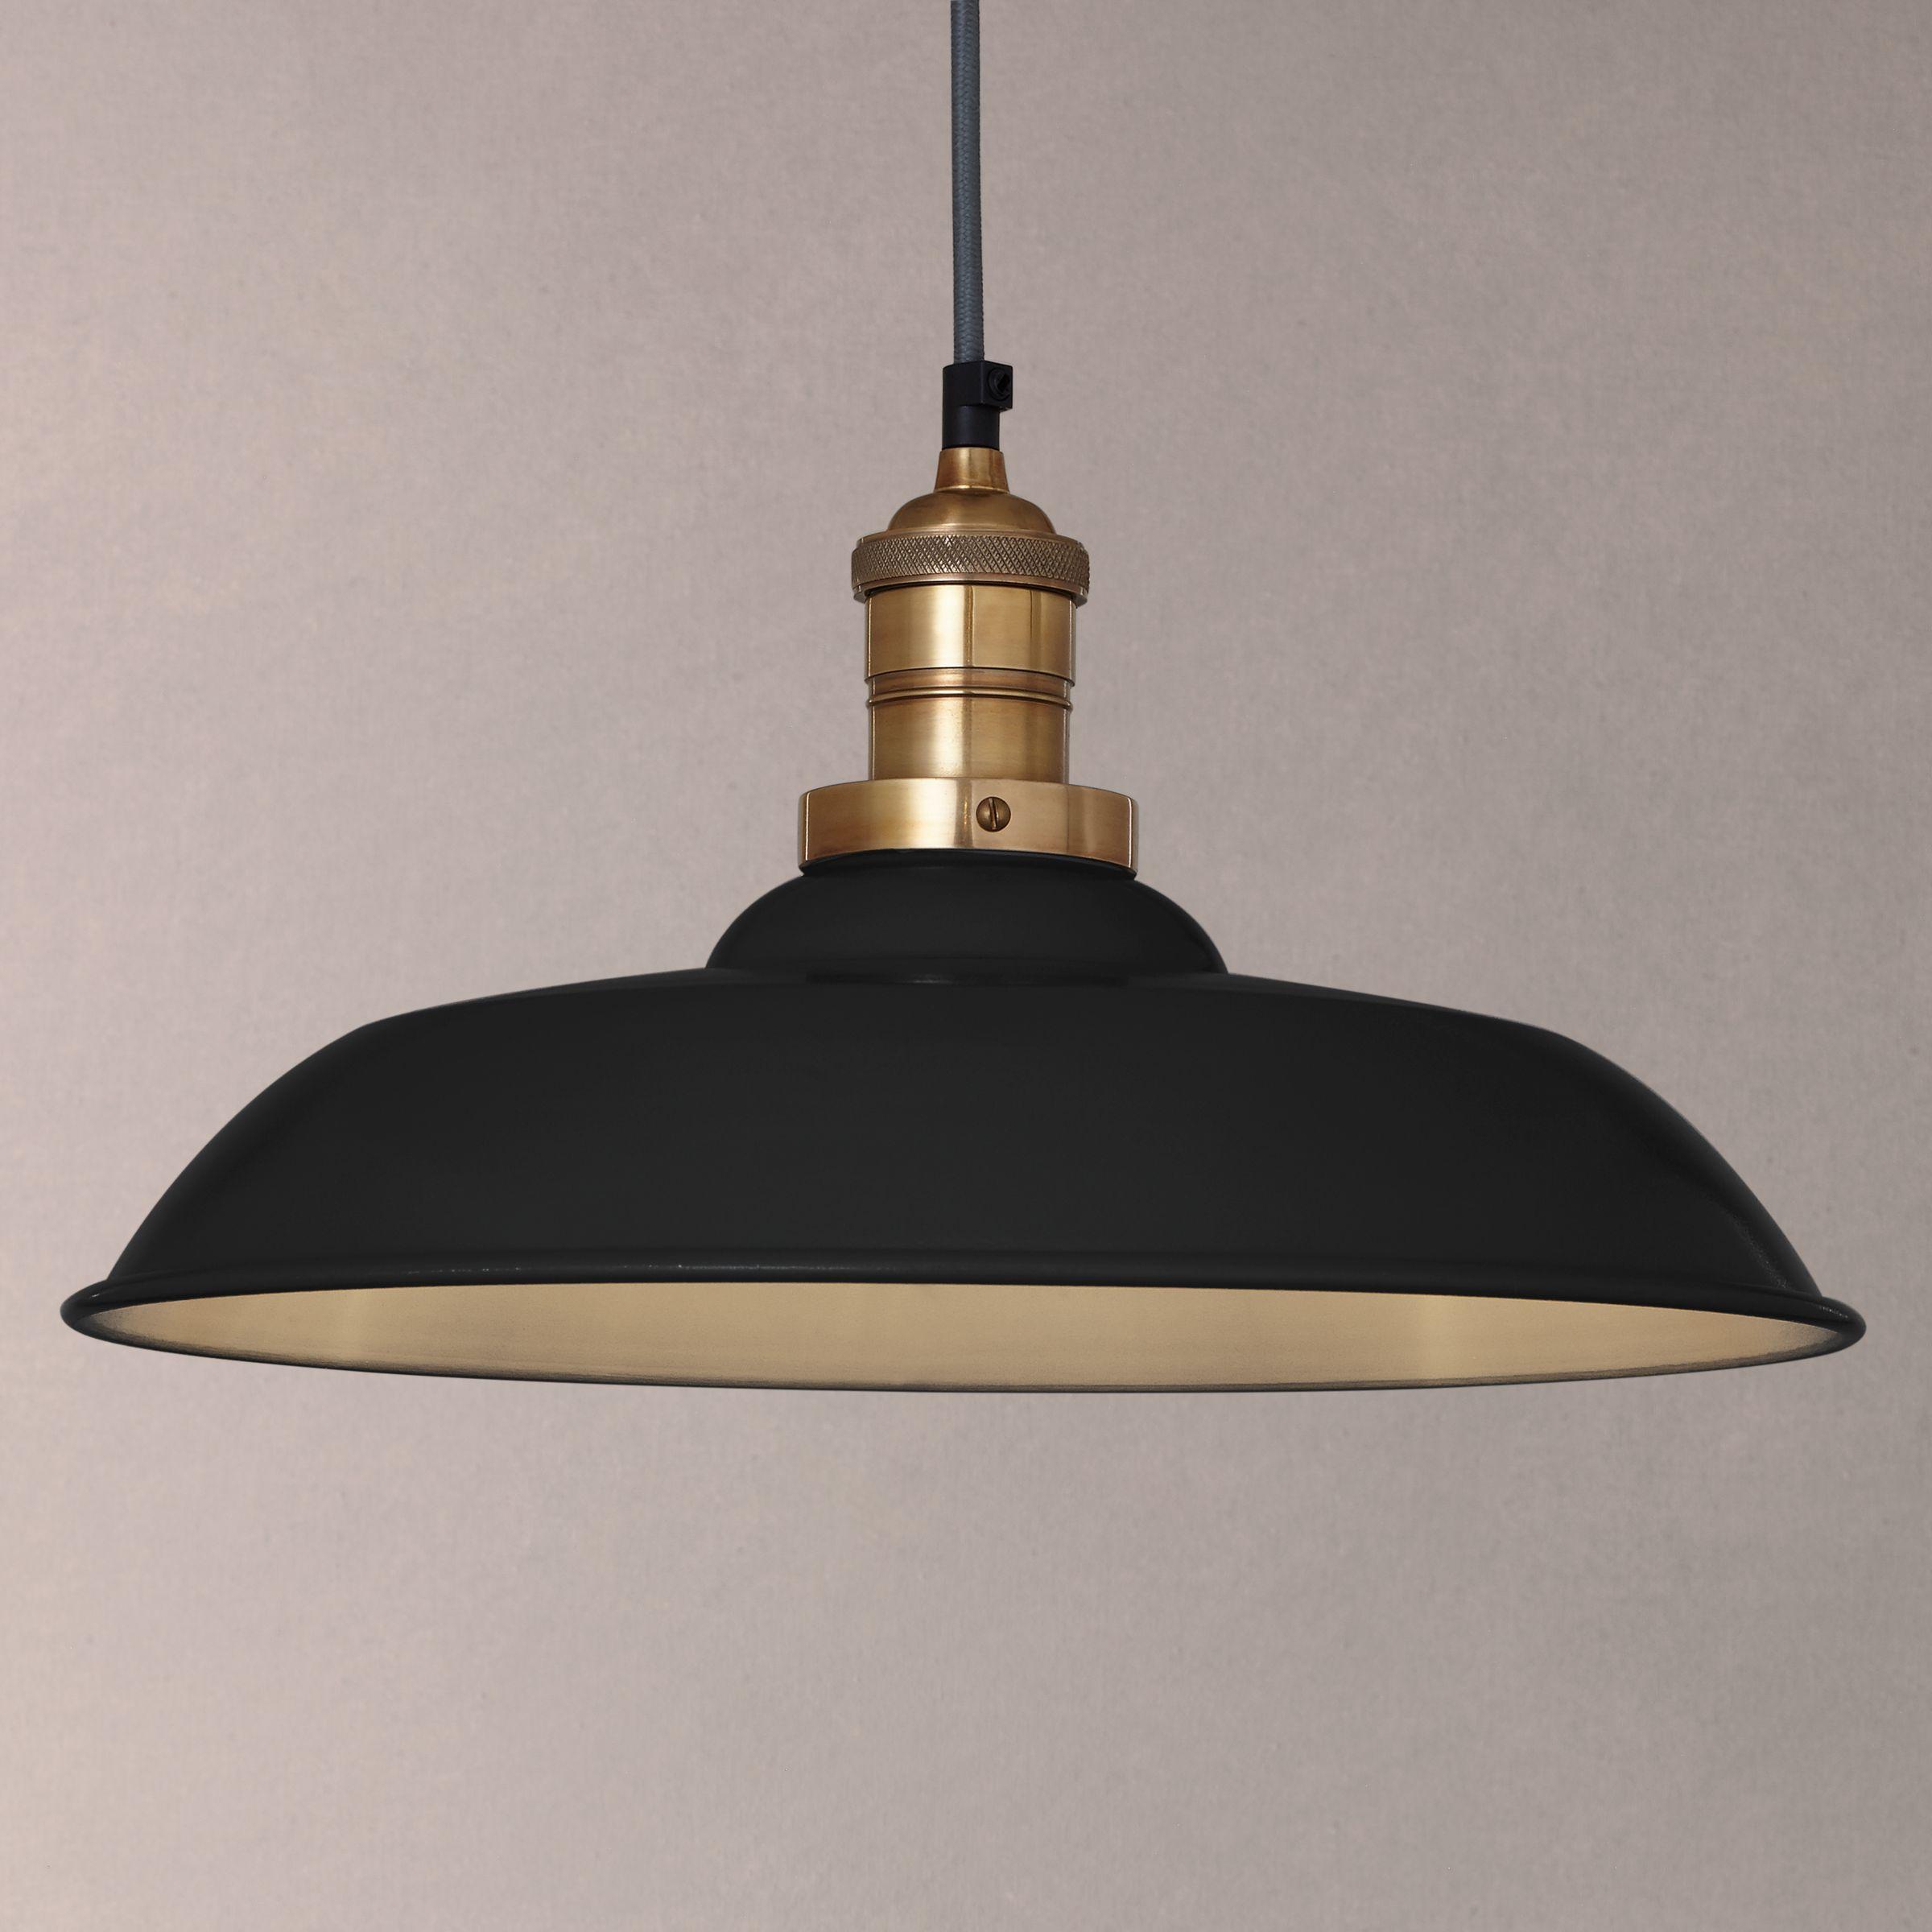 Croft Collection Clyde Brass Trim Ceiling Pendant Light Black At John Lewis Partners